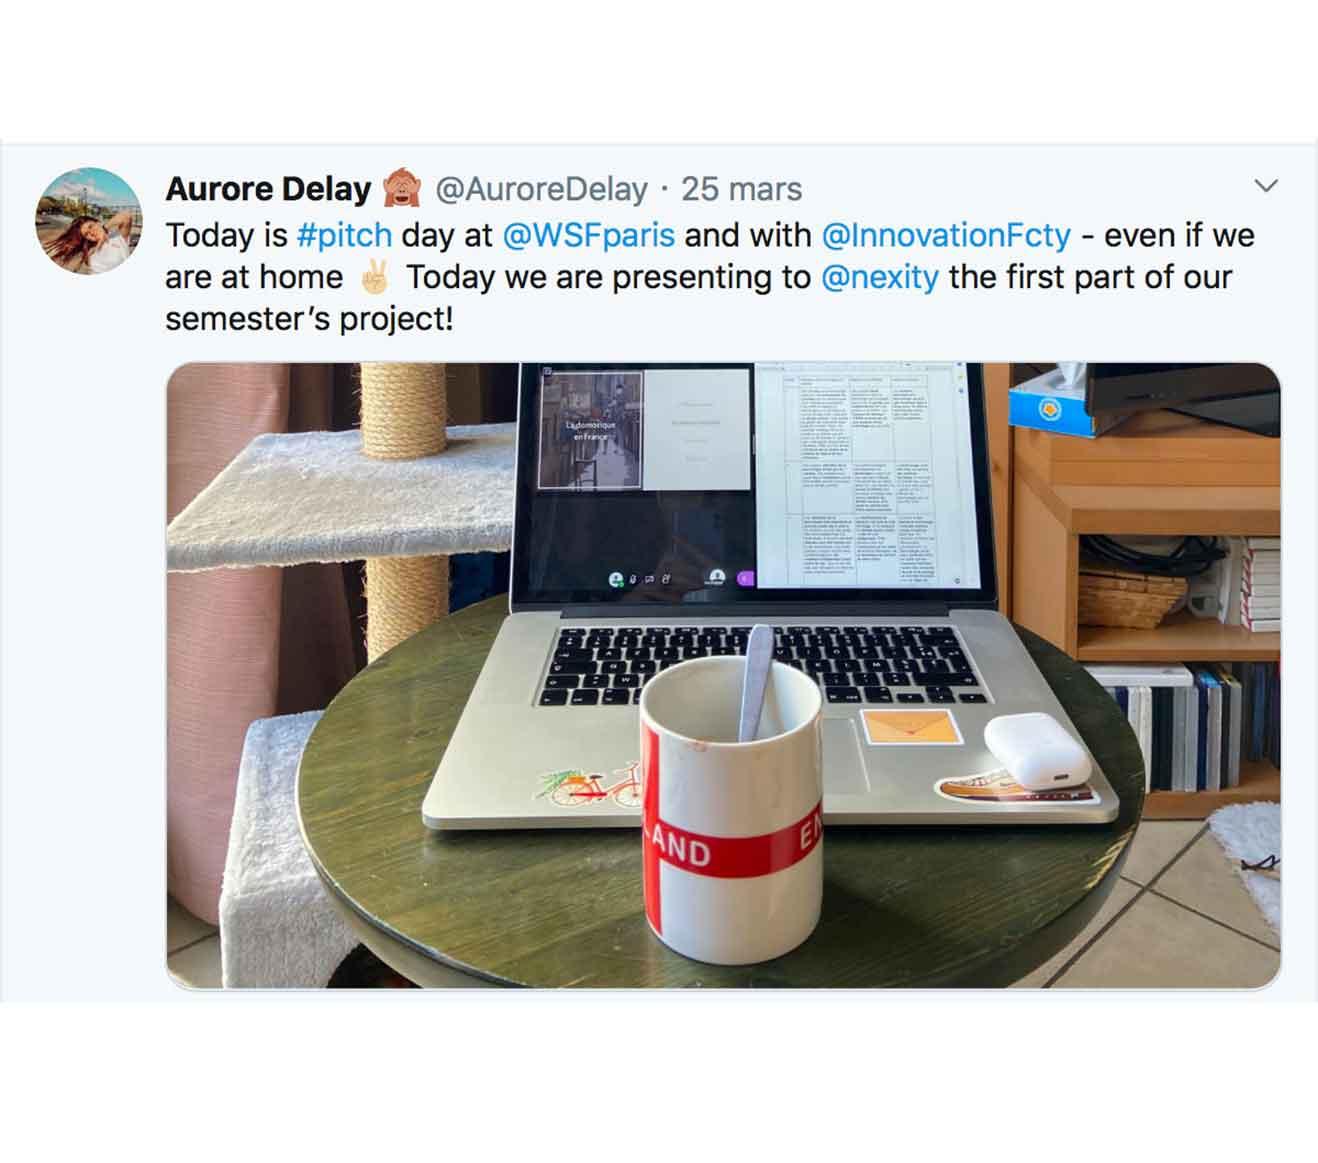 Tweet Aurore Delay